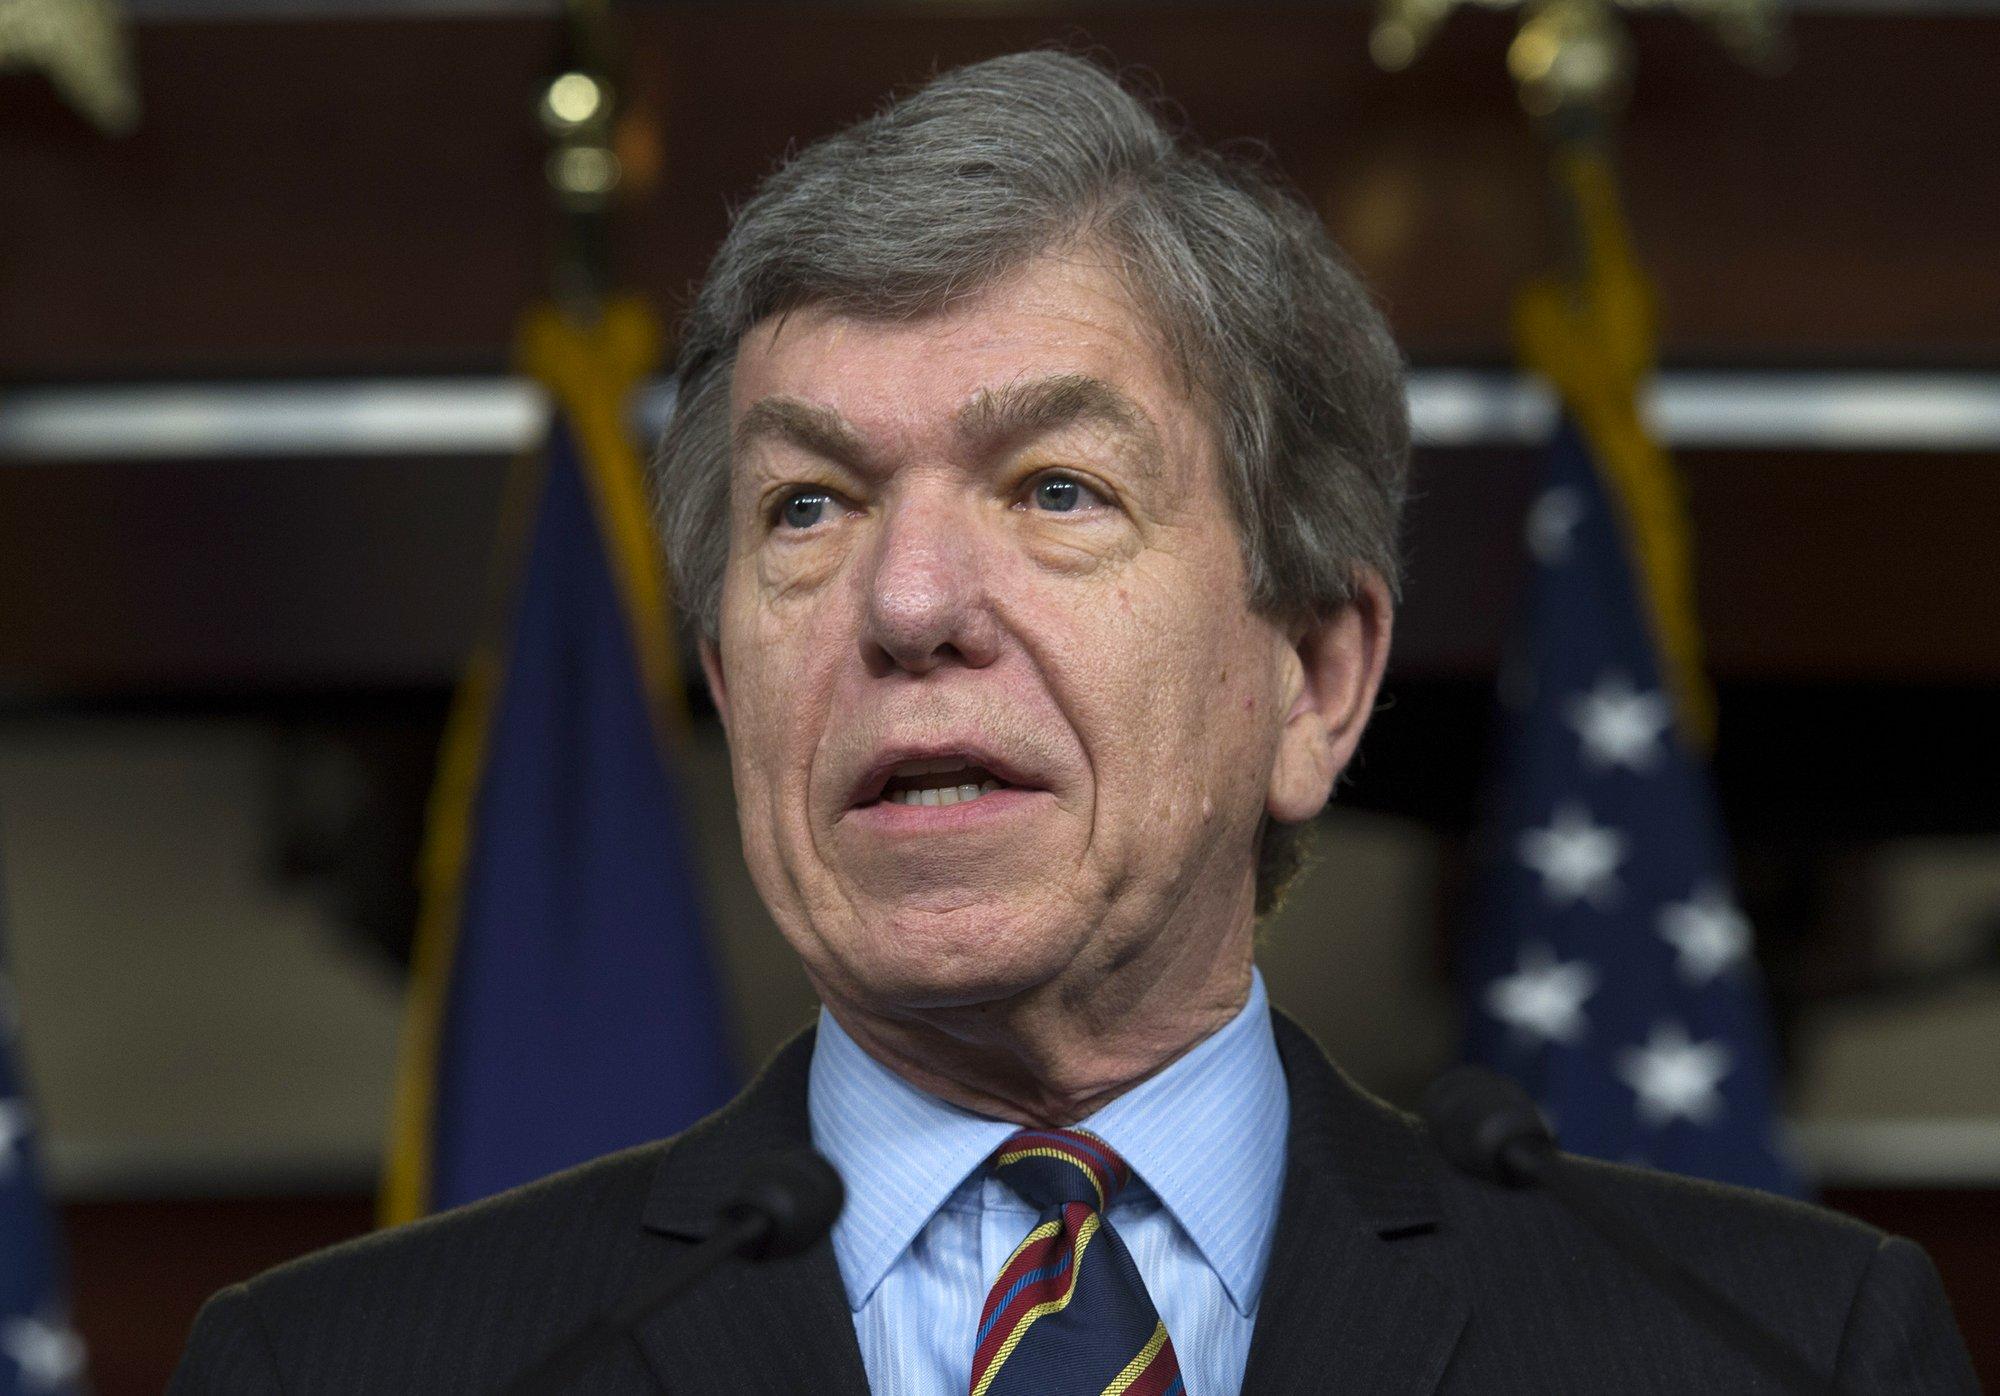 Senate control may be at stake in GOP-friendly Missouri